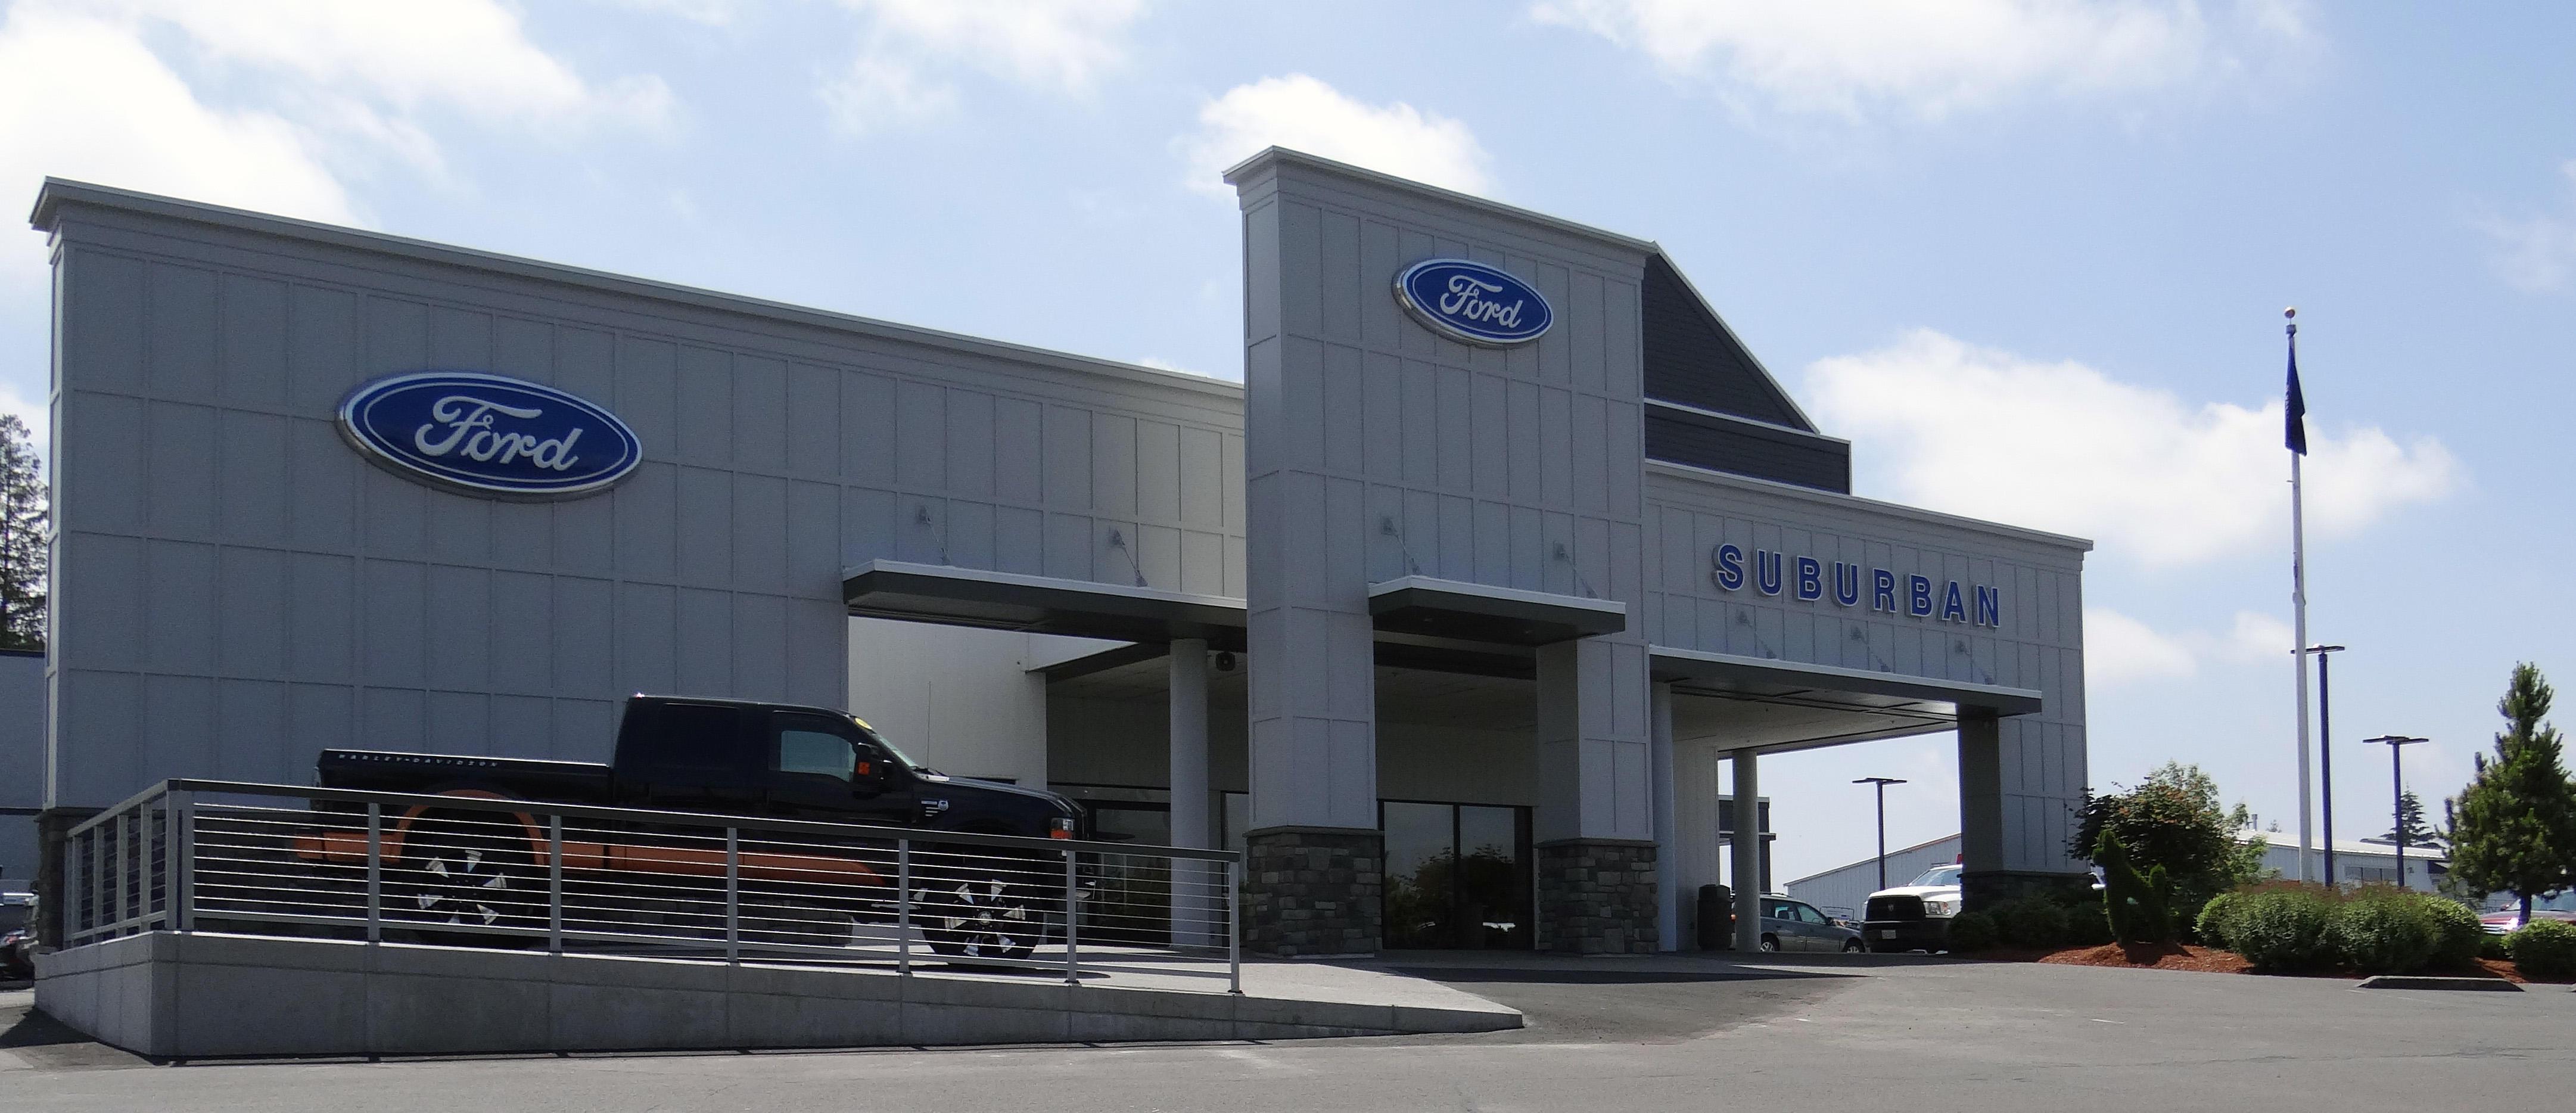 Suburban Ford image 0